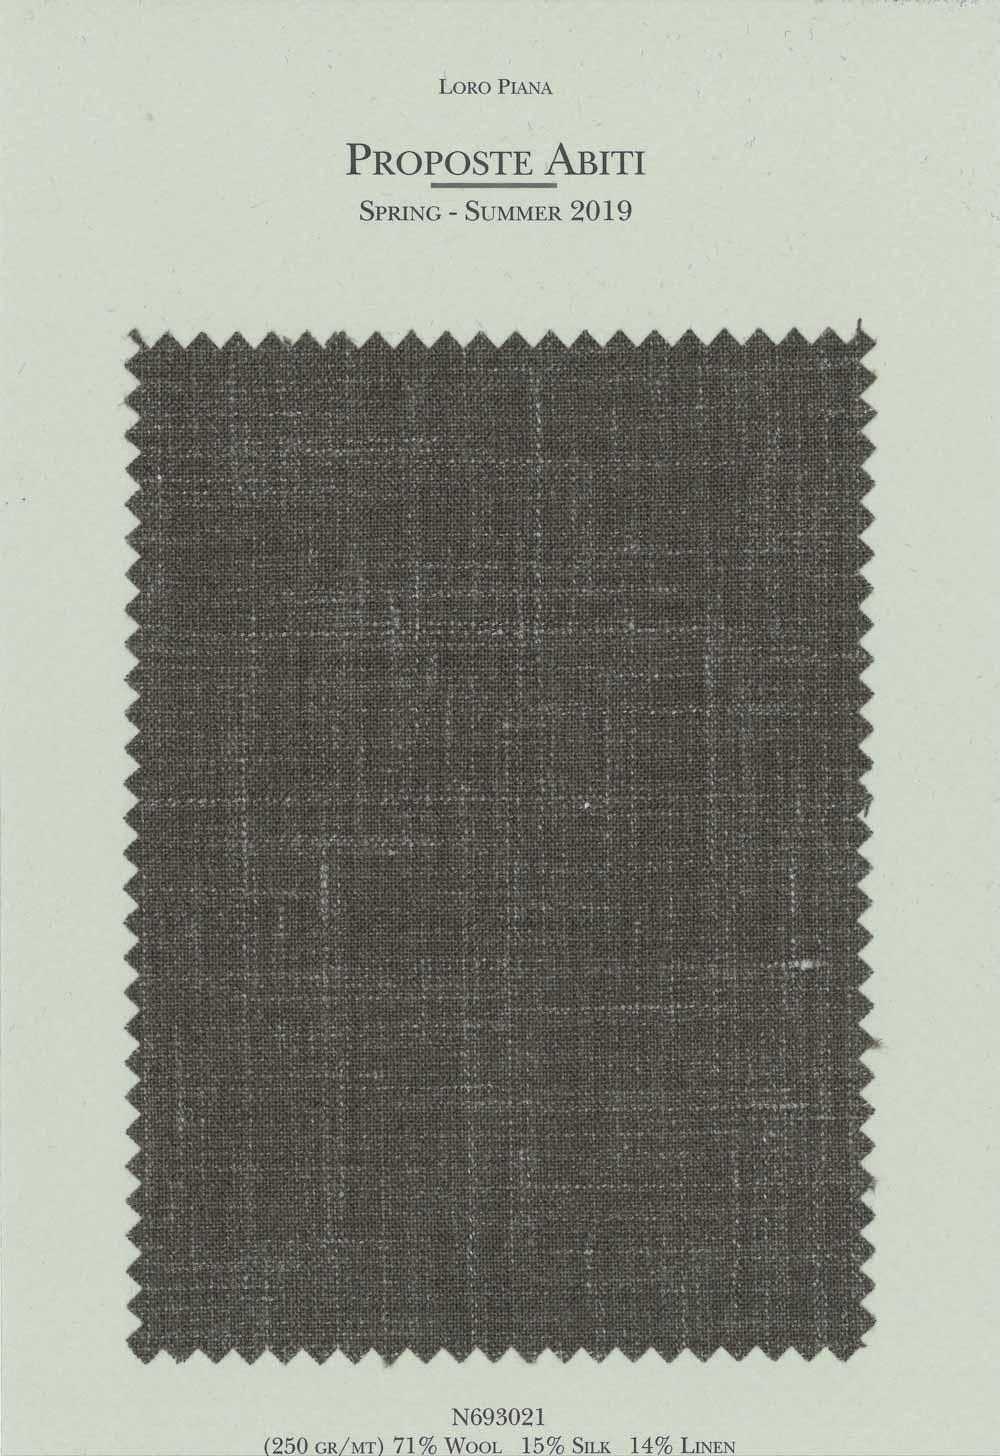 N693021